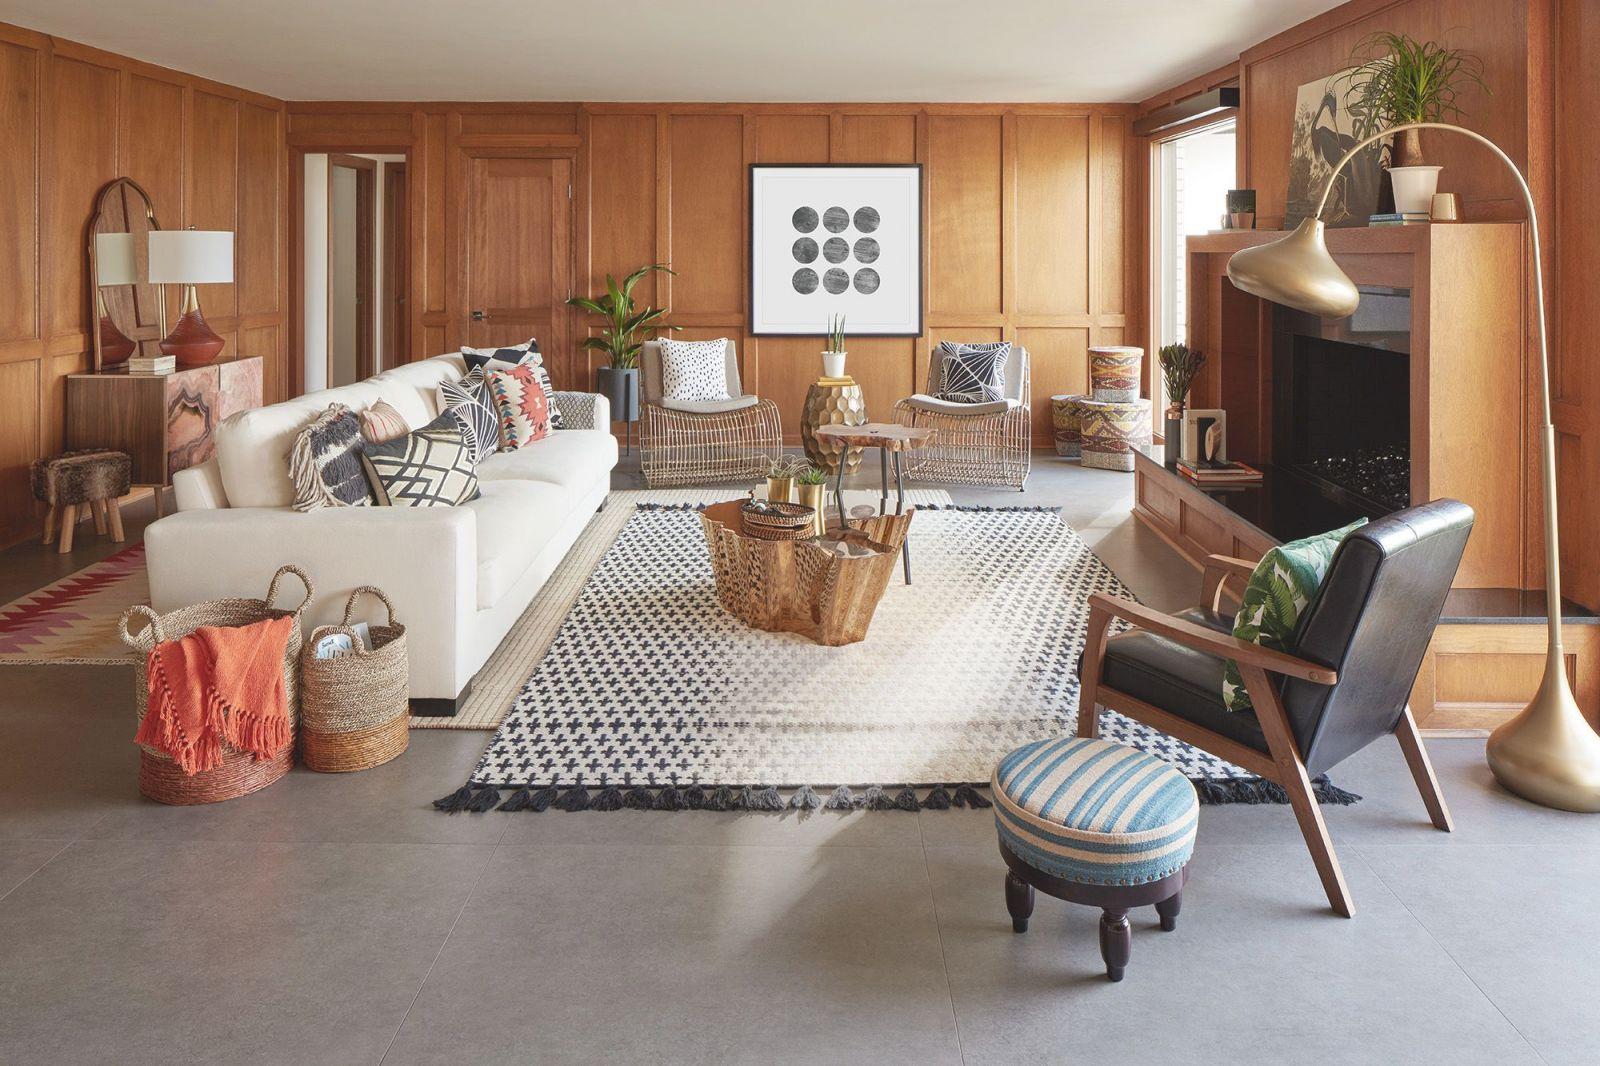 10 Best Modern Living Room Design Ideas In 2018 – Modern inside 8+ Amazing Ideas For Ideas For Living Room Decoration Modern